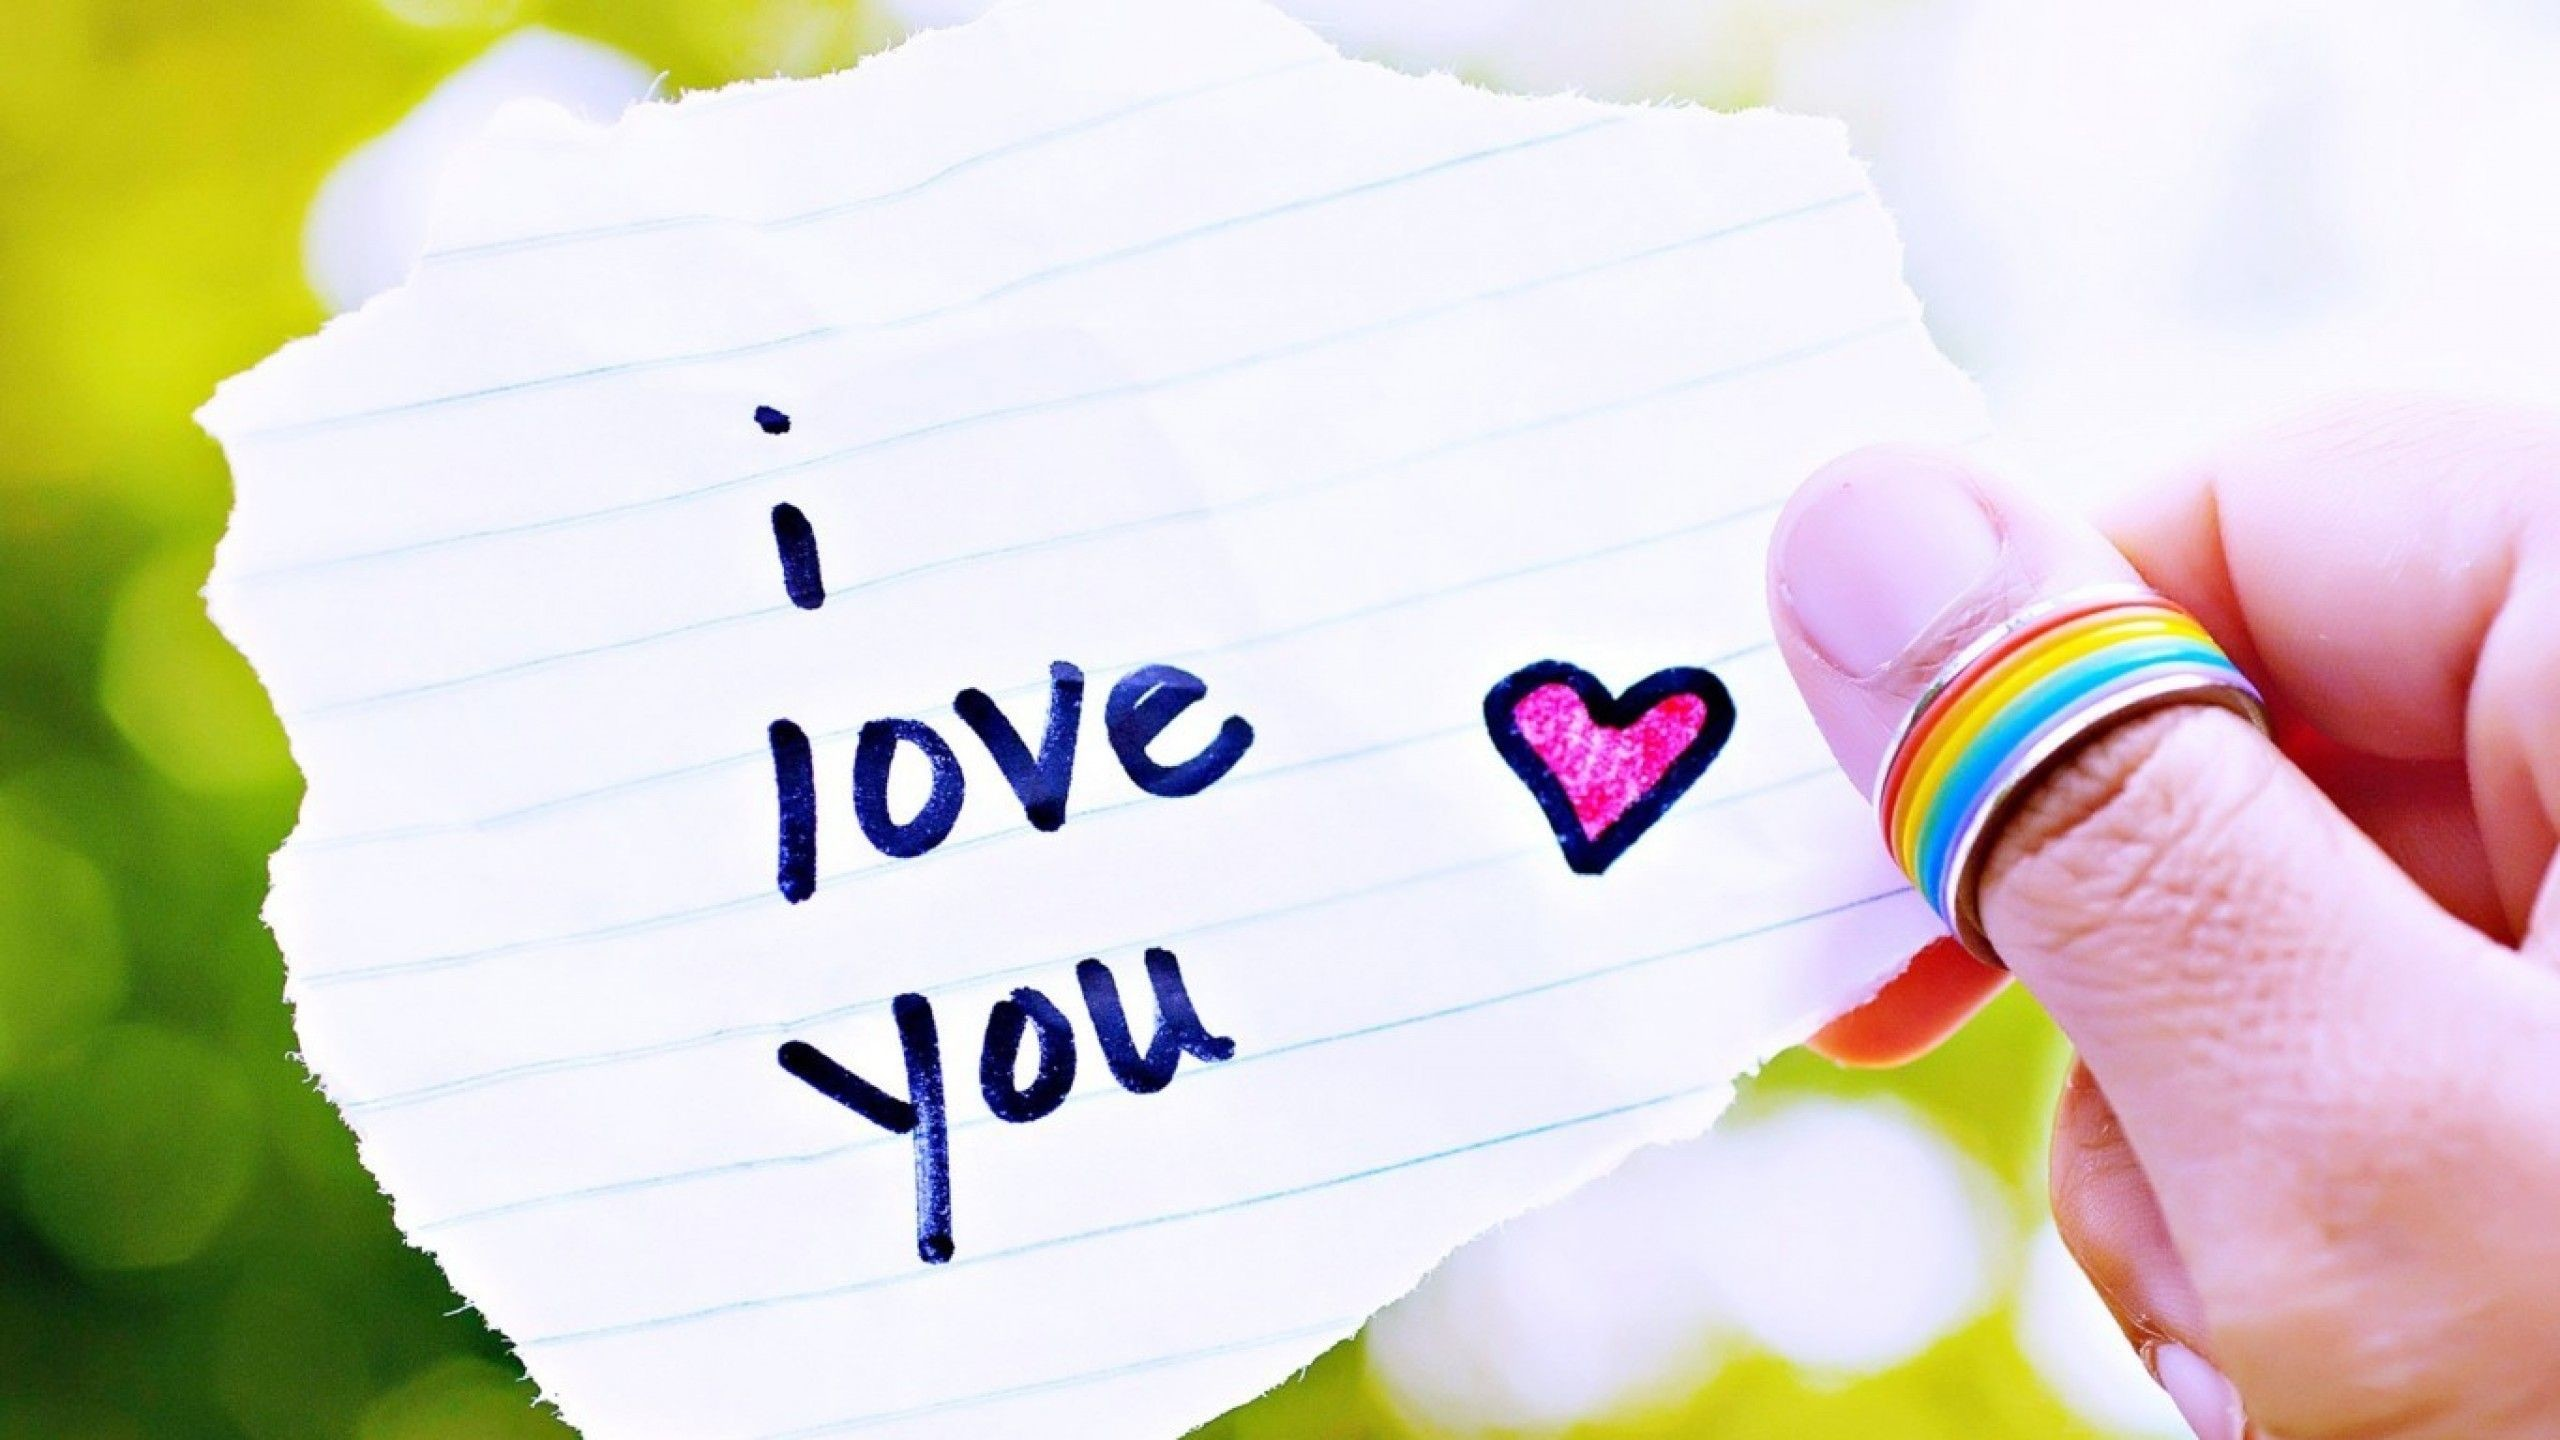 I Love You Wallpaper Hd 72 Images